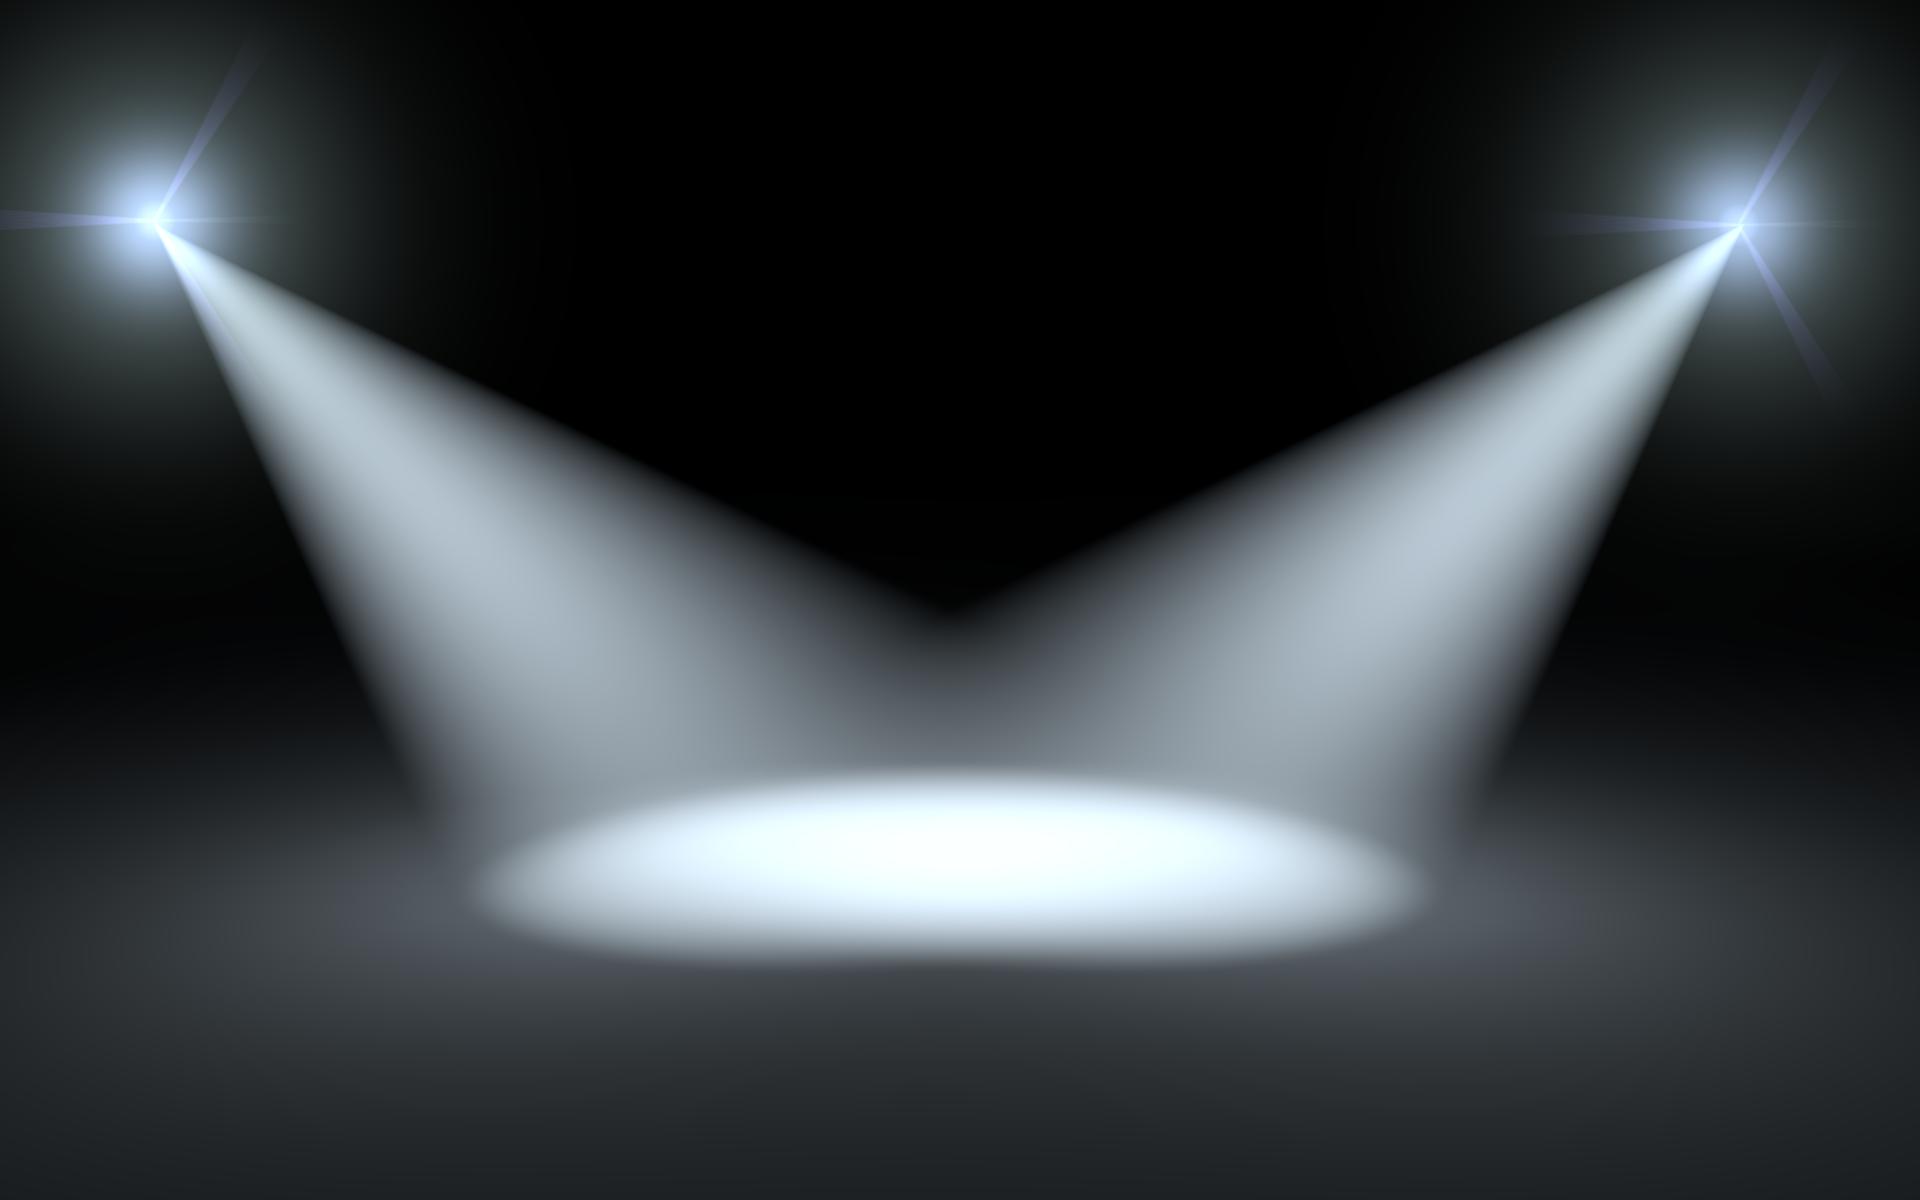 Spotlight black and white clipart 3